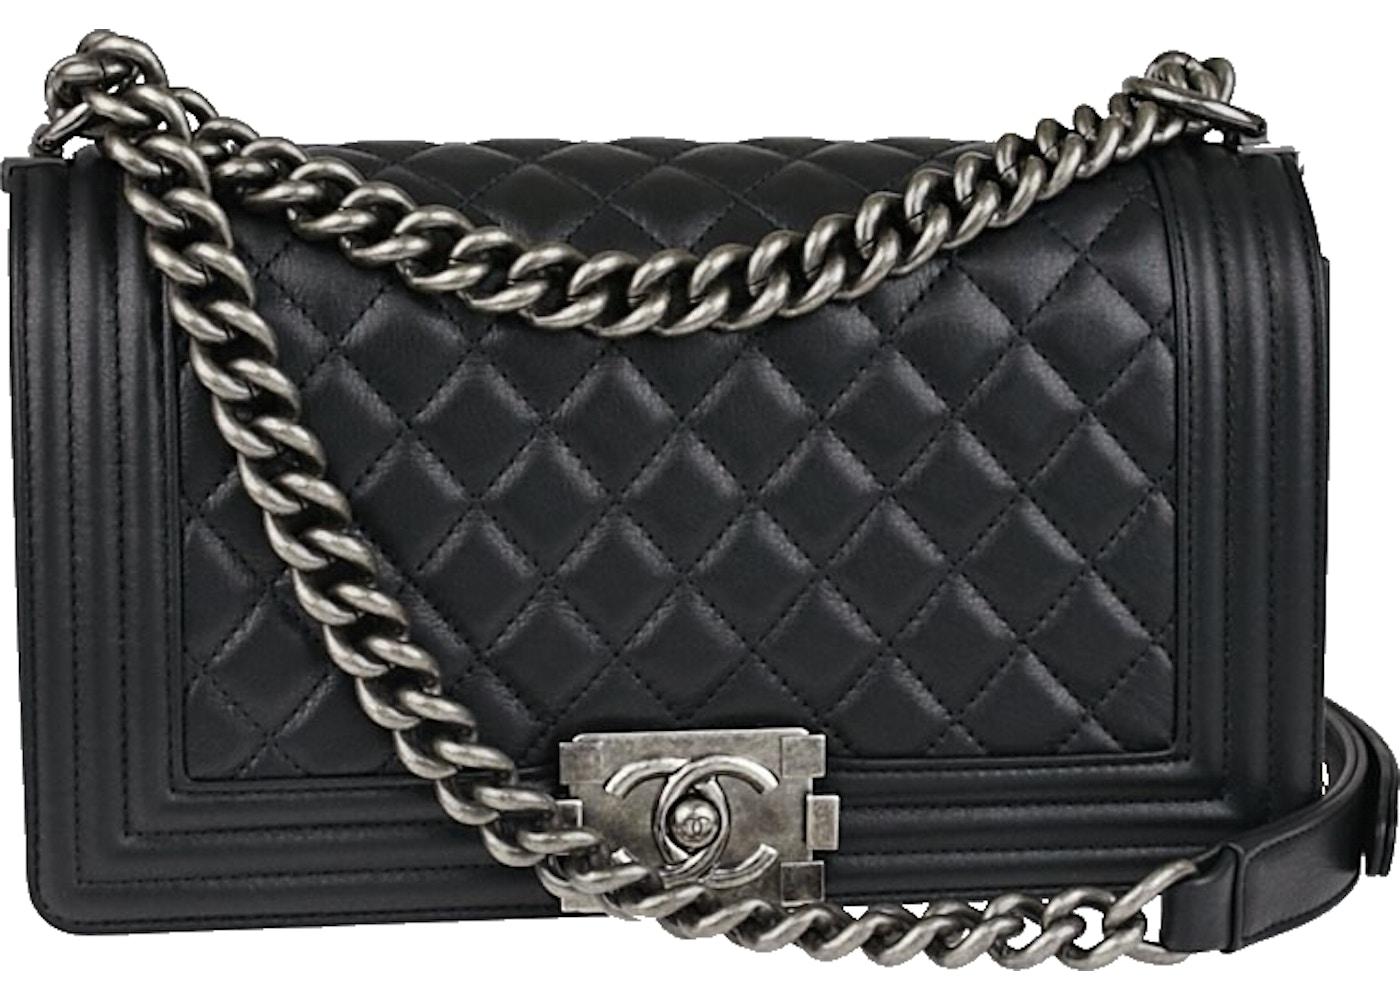 5acd347ccf56 Chanel Boy Flap Quilted Calfskin Medium Black